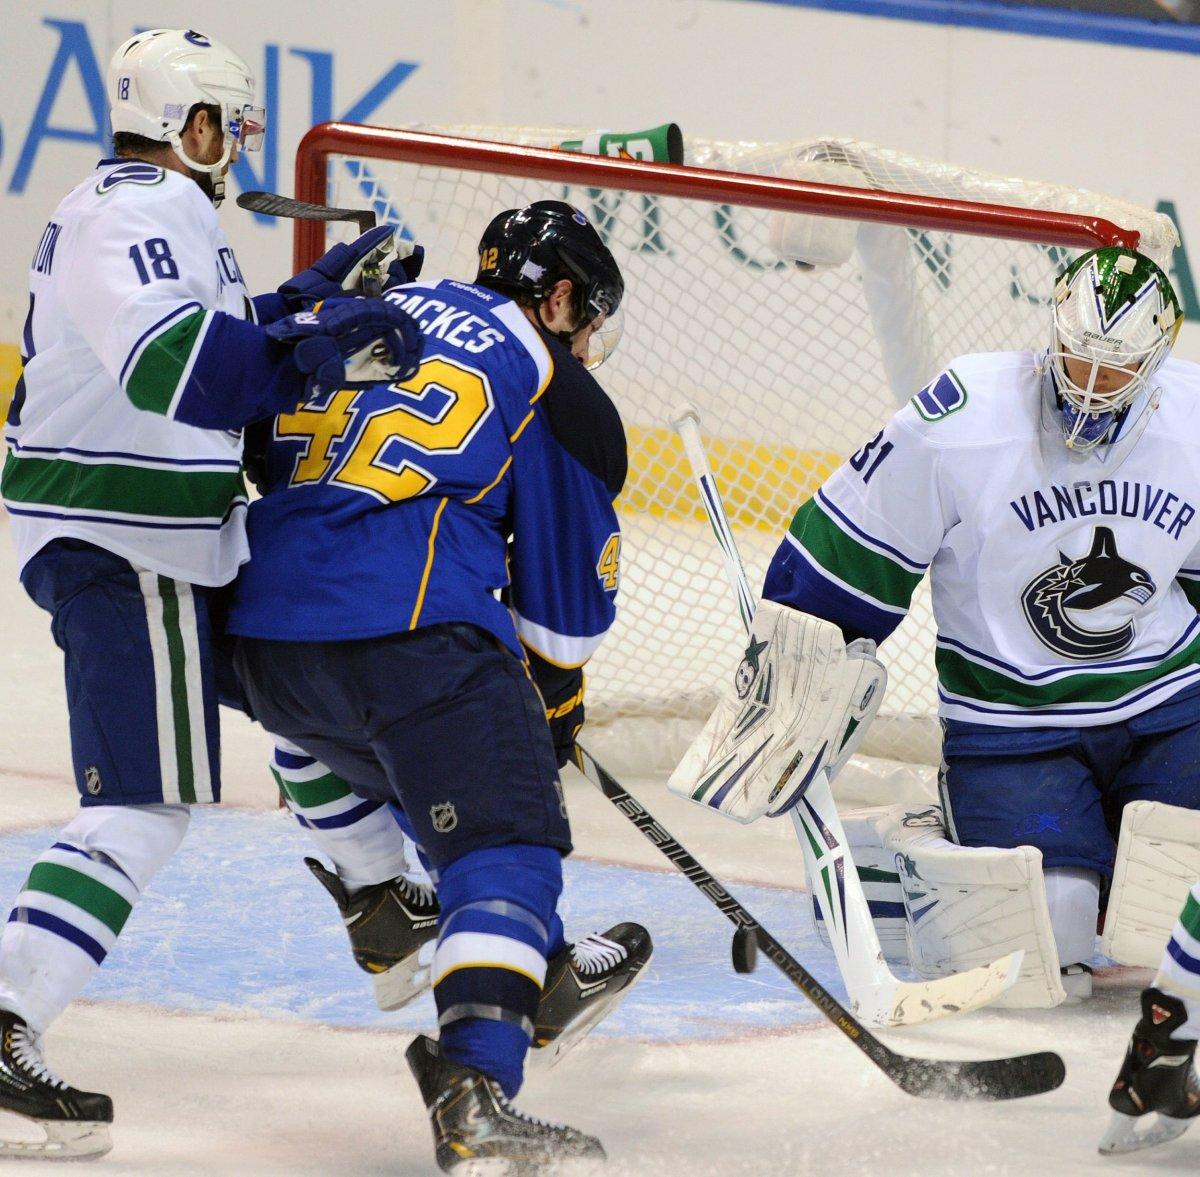 Vancouver Canucks' goalie Eddie Lack blocks a shot by David Backes in St. Louis. (AP Photo/Bill Boyce).